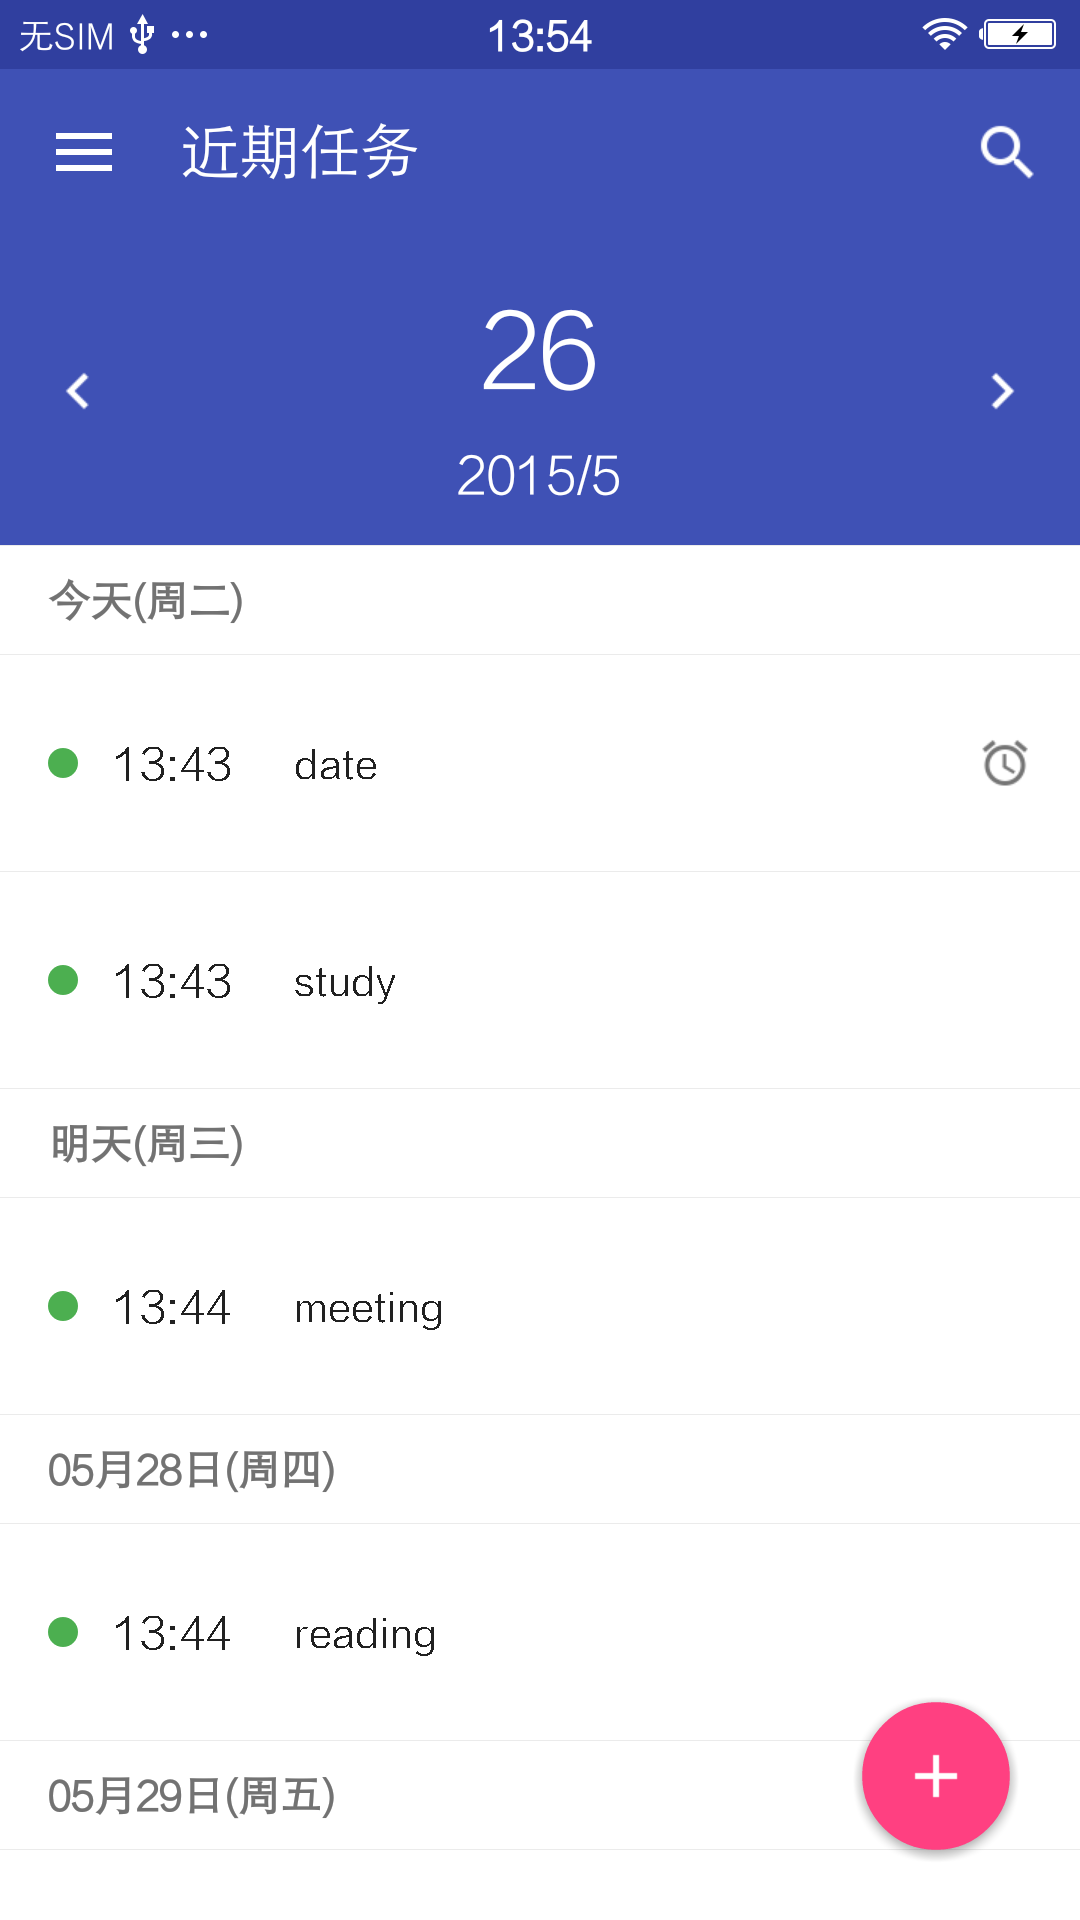 TT日程管理 V3.0.2 安卓版截图1